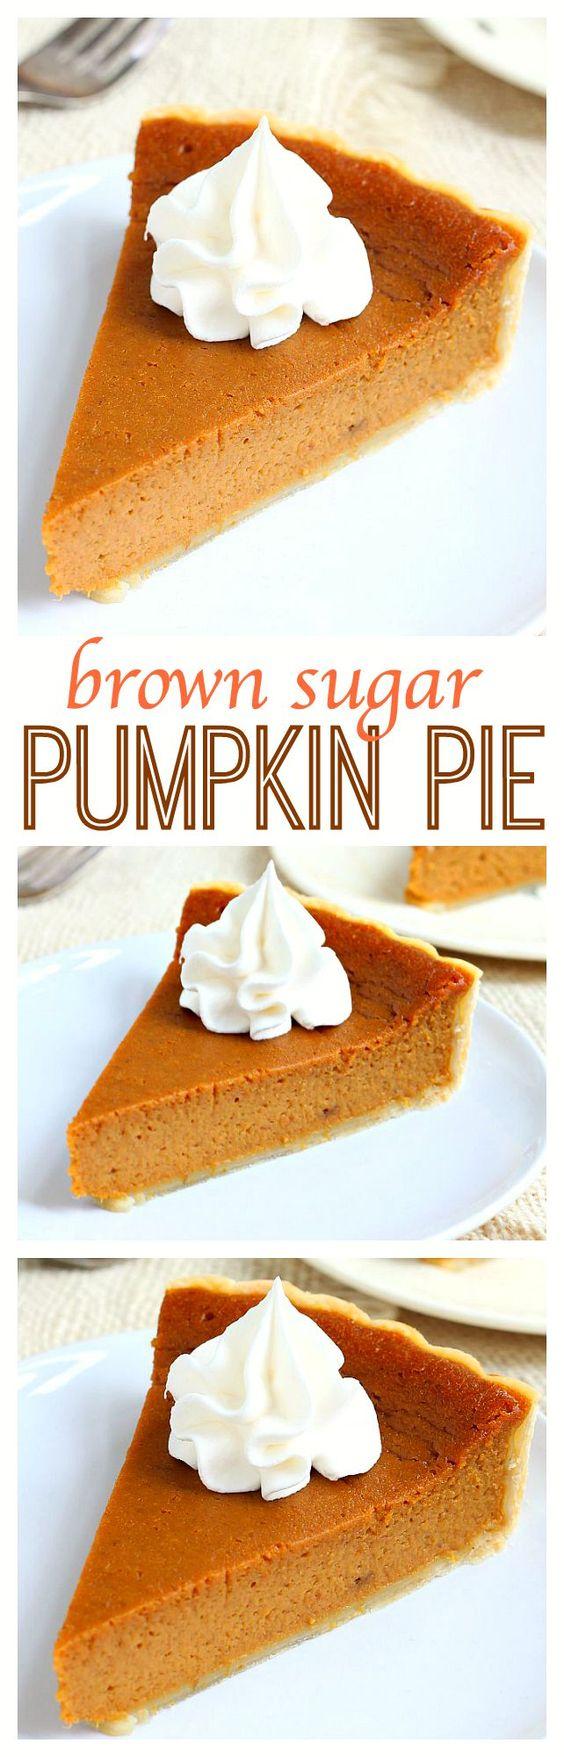 Sugar pumpkin, Pumpkin pies and Brown sugar on Pinterest